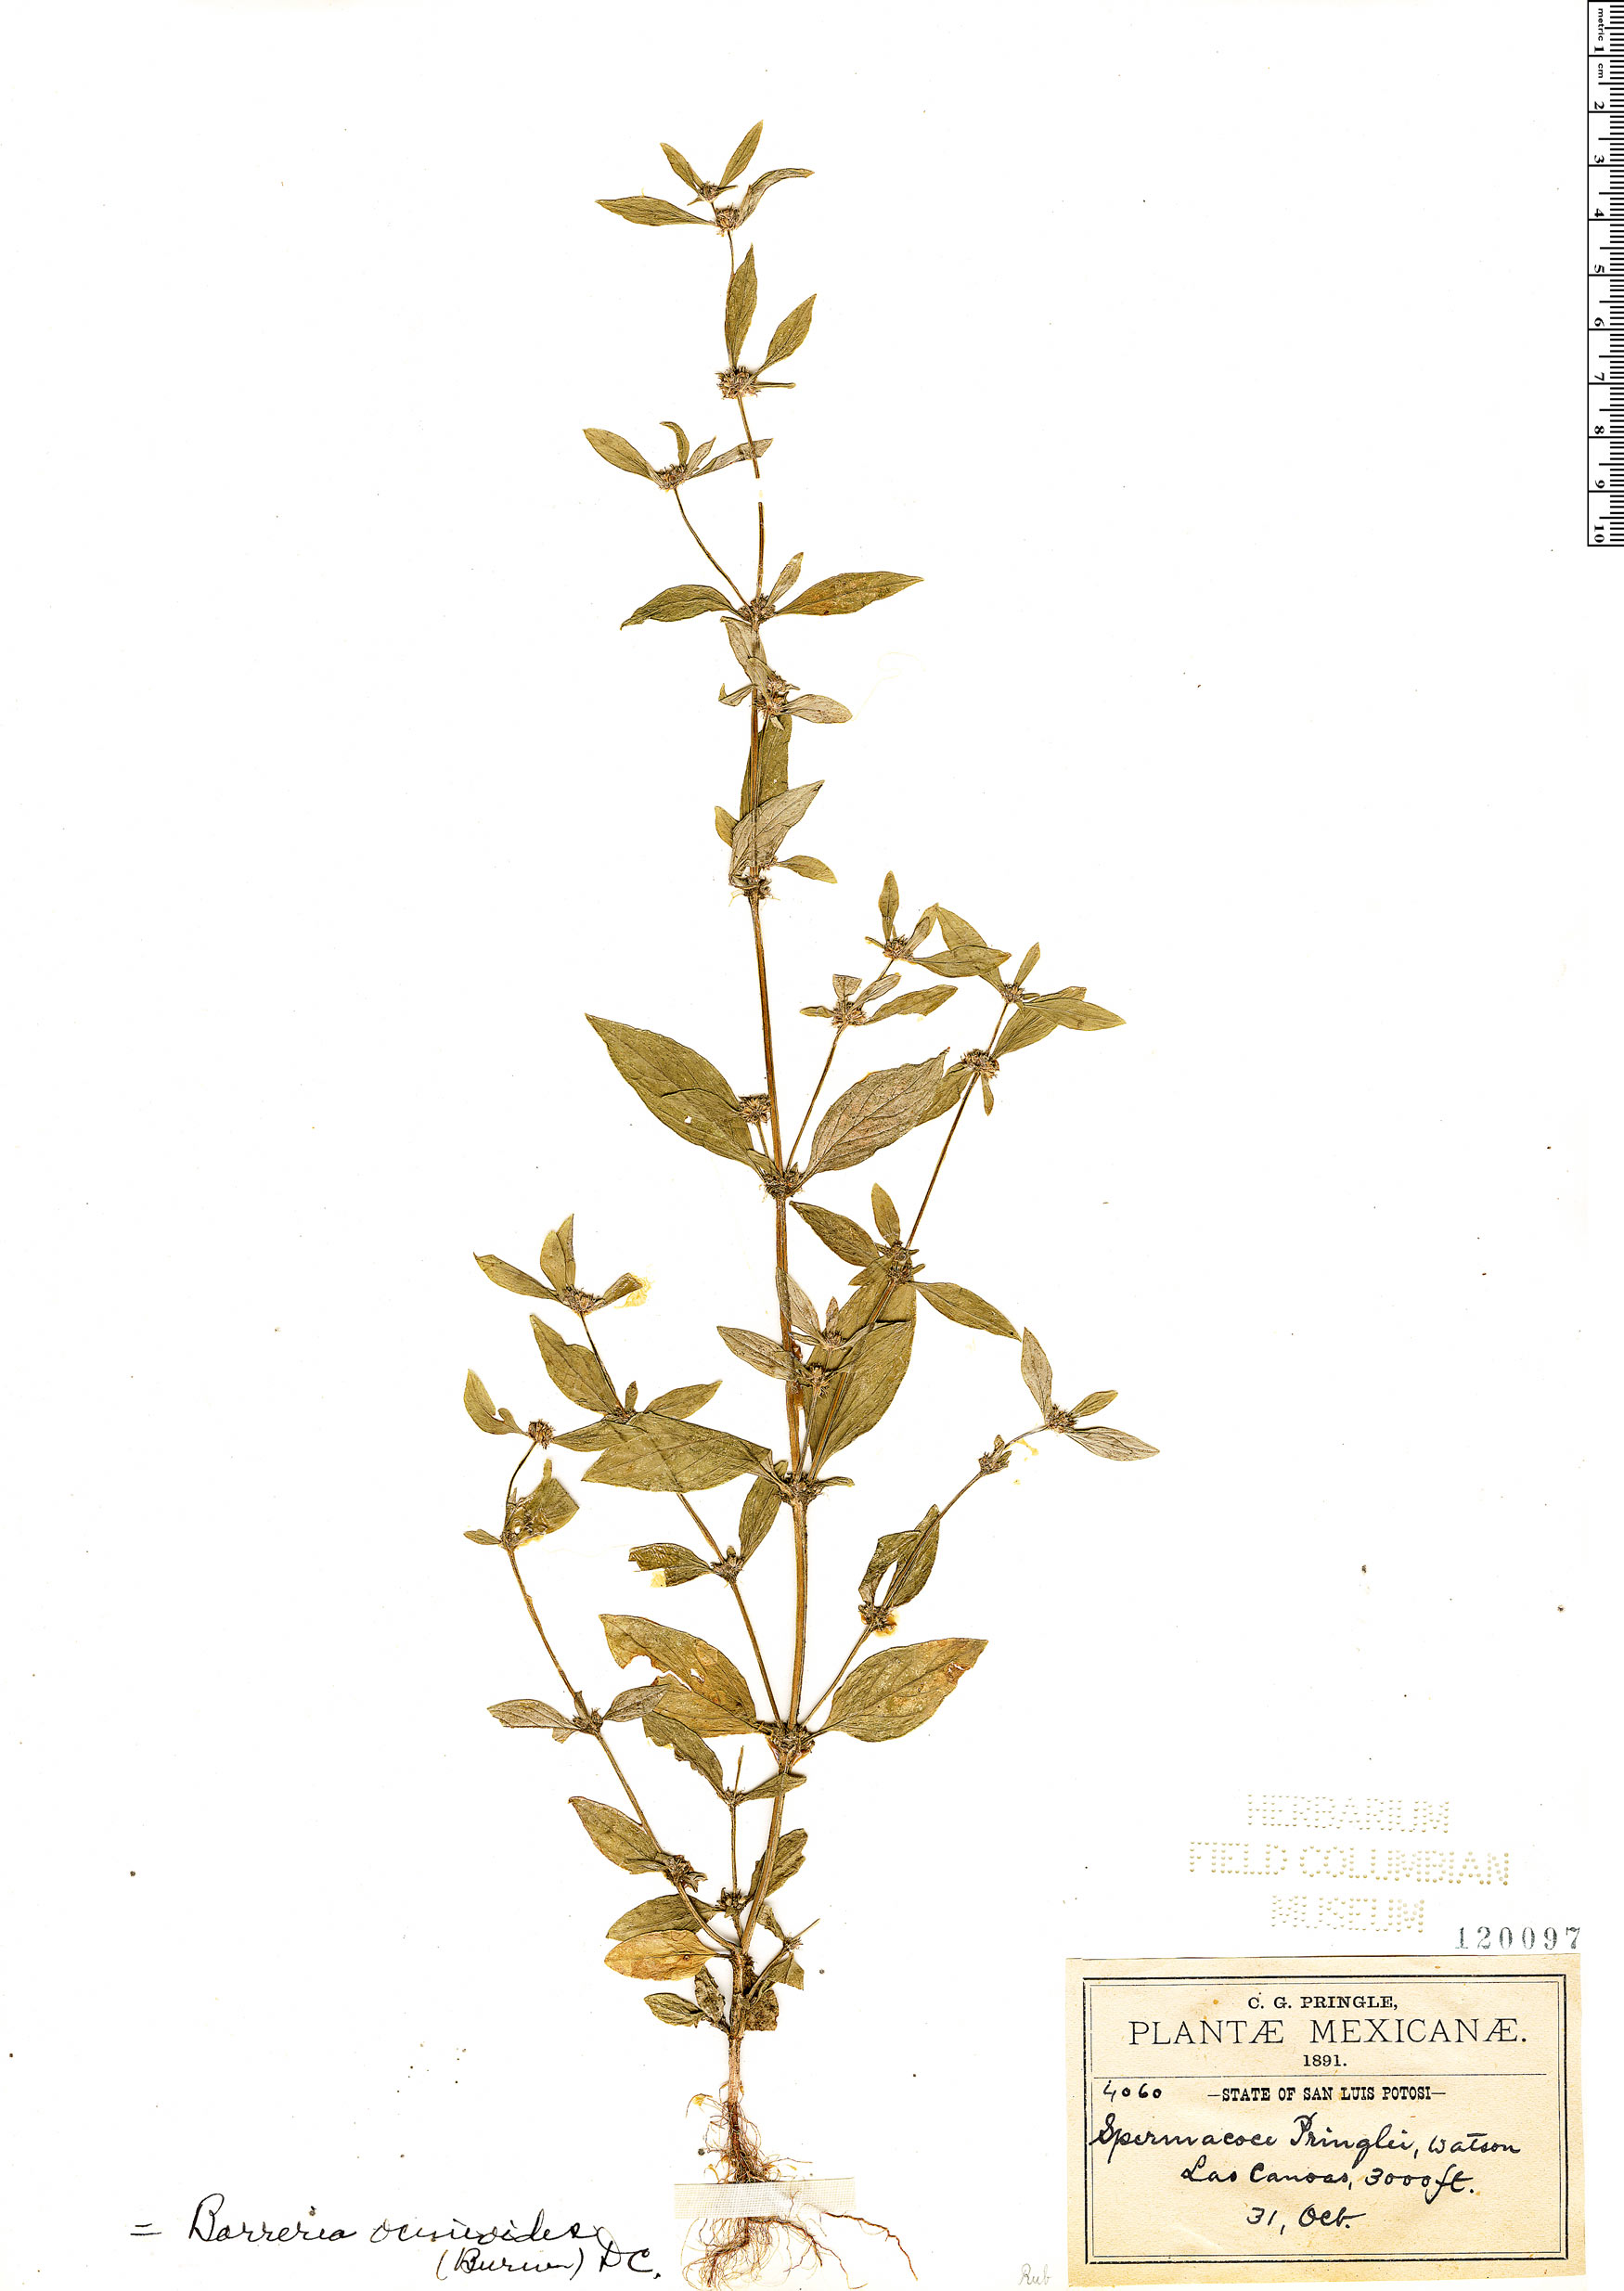 Specimen: Borreria ovalifolia